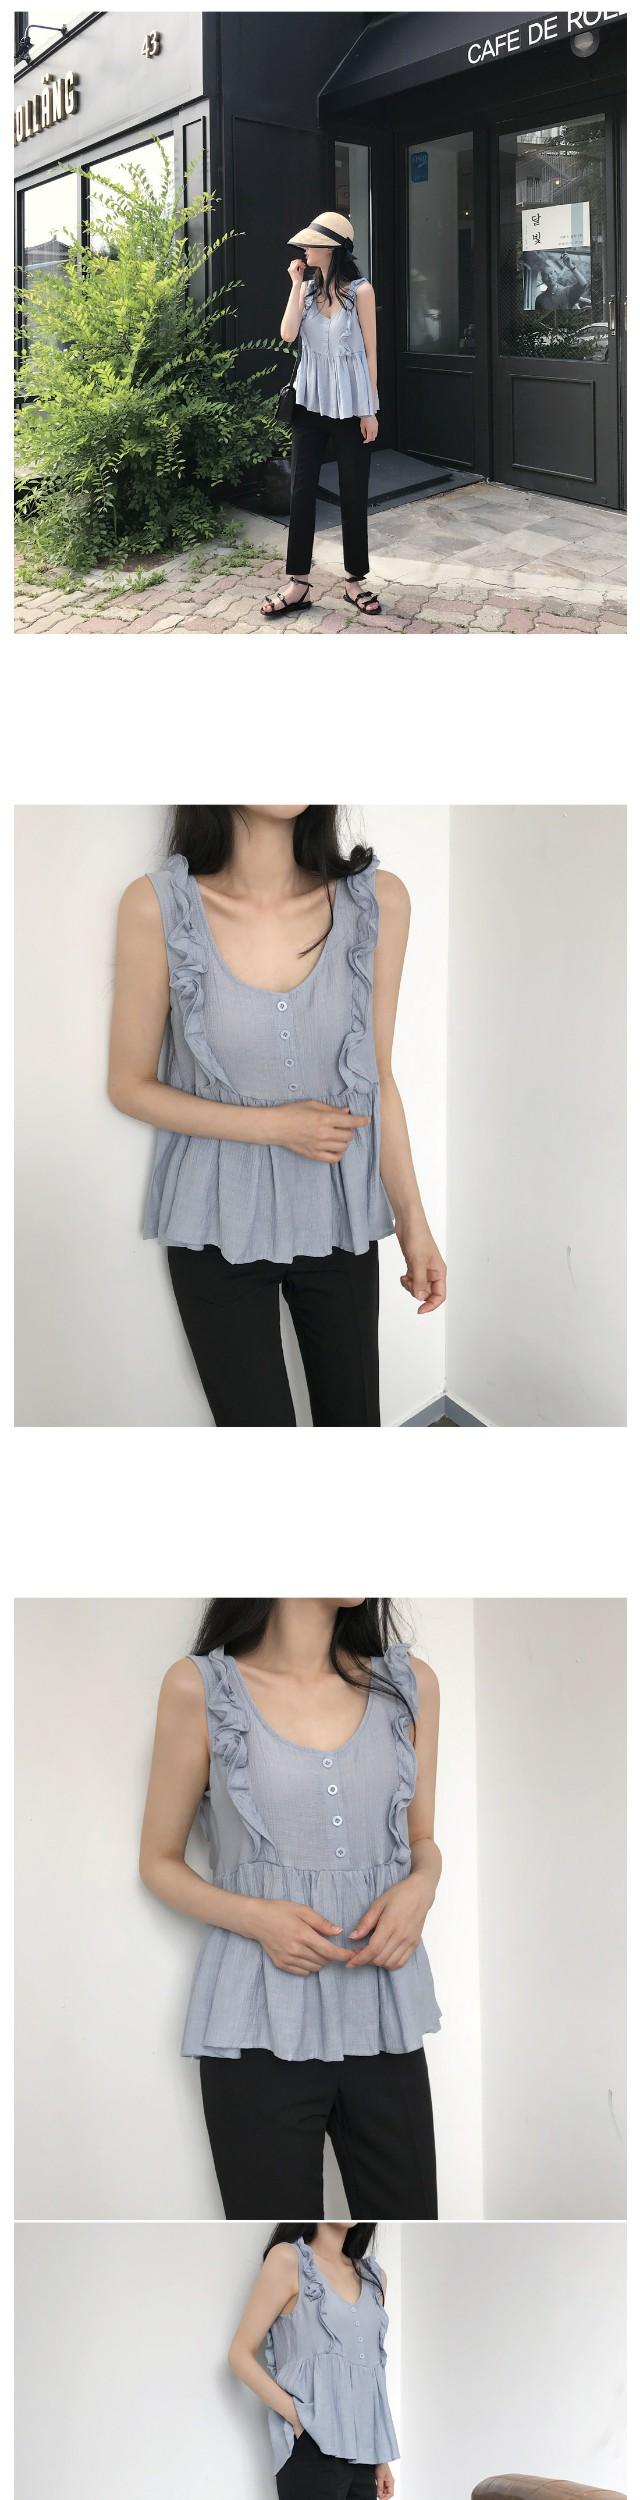 Ruffle button nail blouse